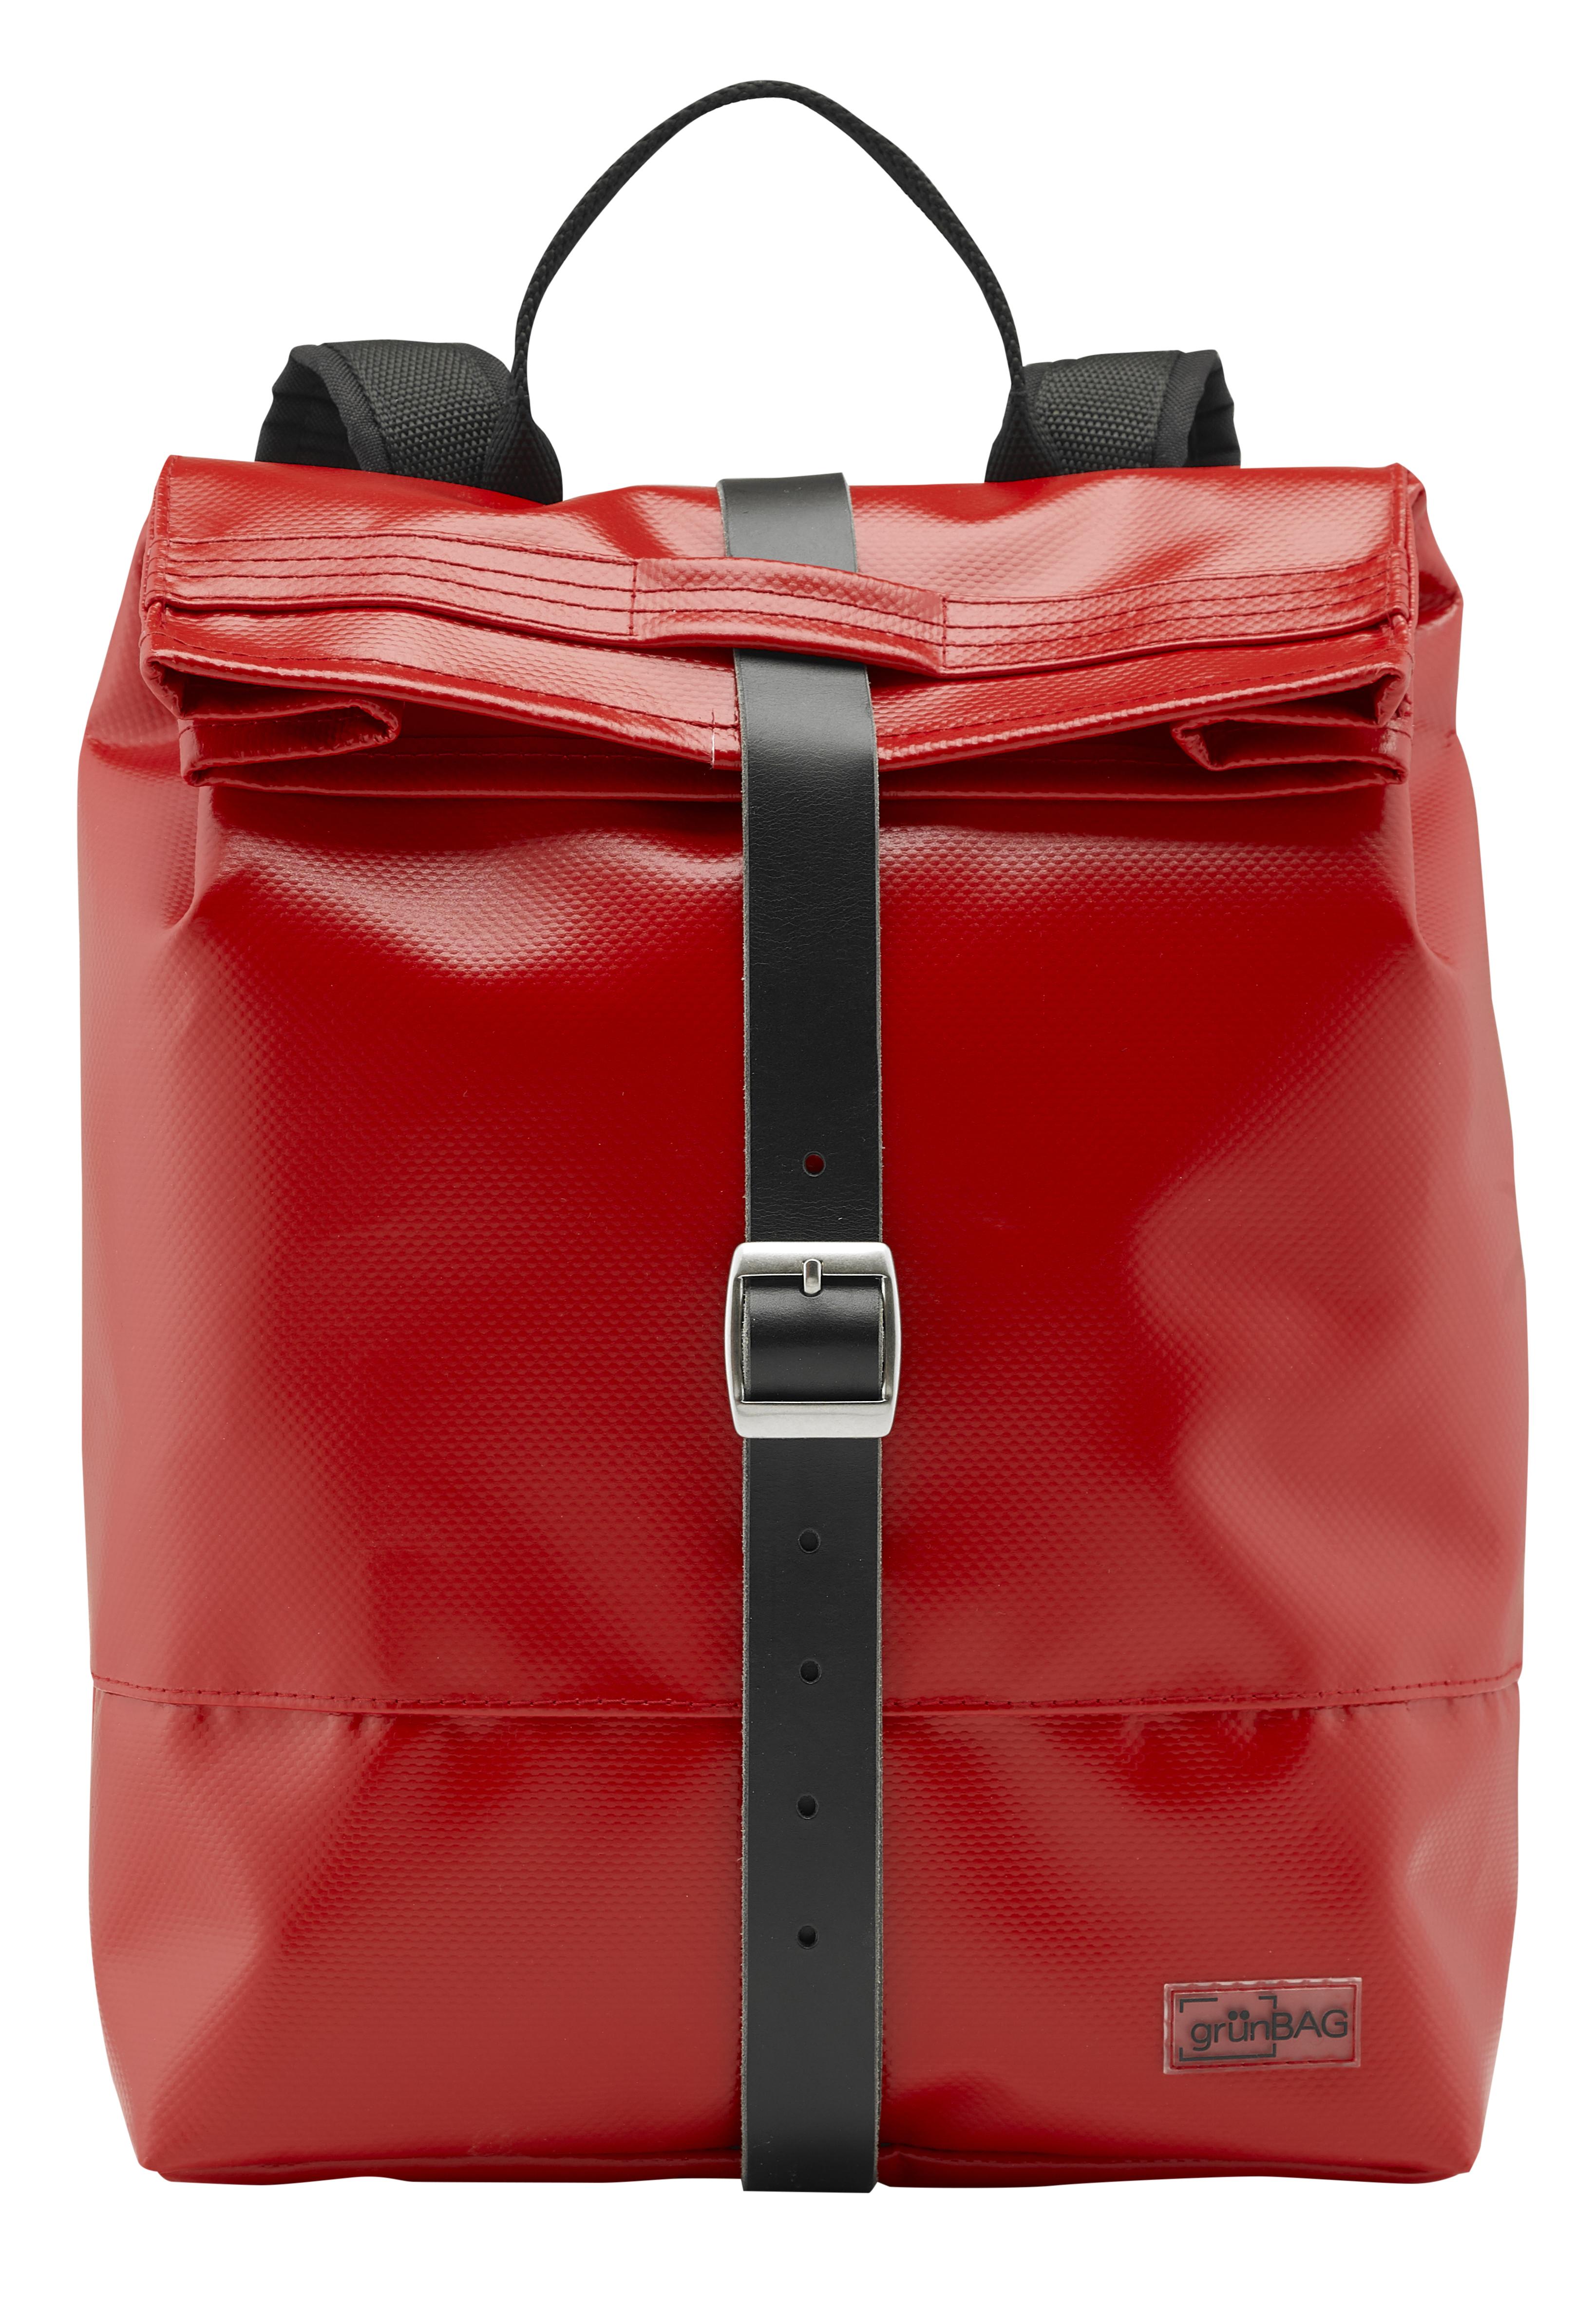 BackPack Liv Red